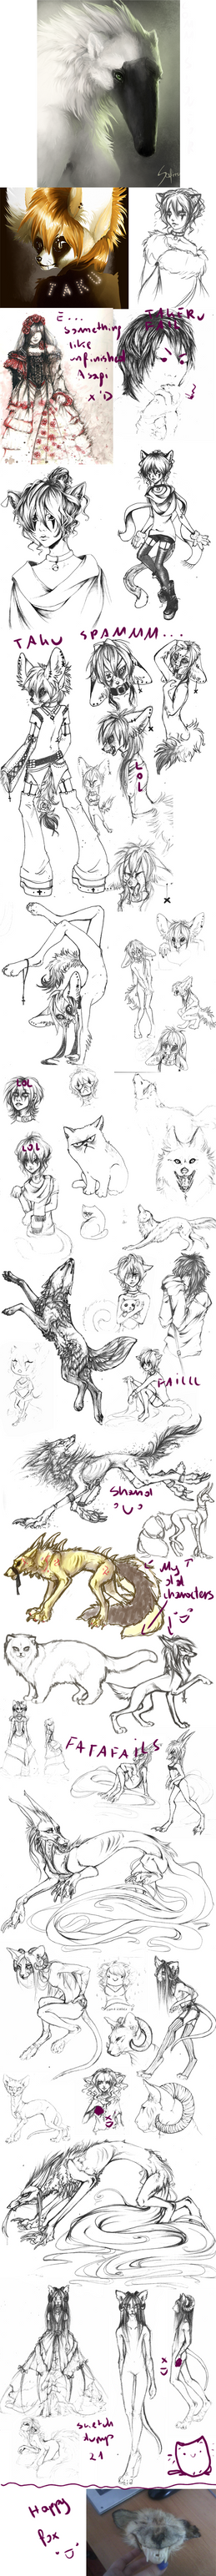 Sketch dump 21. by Safiru